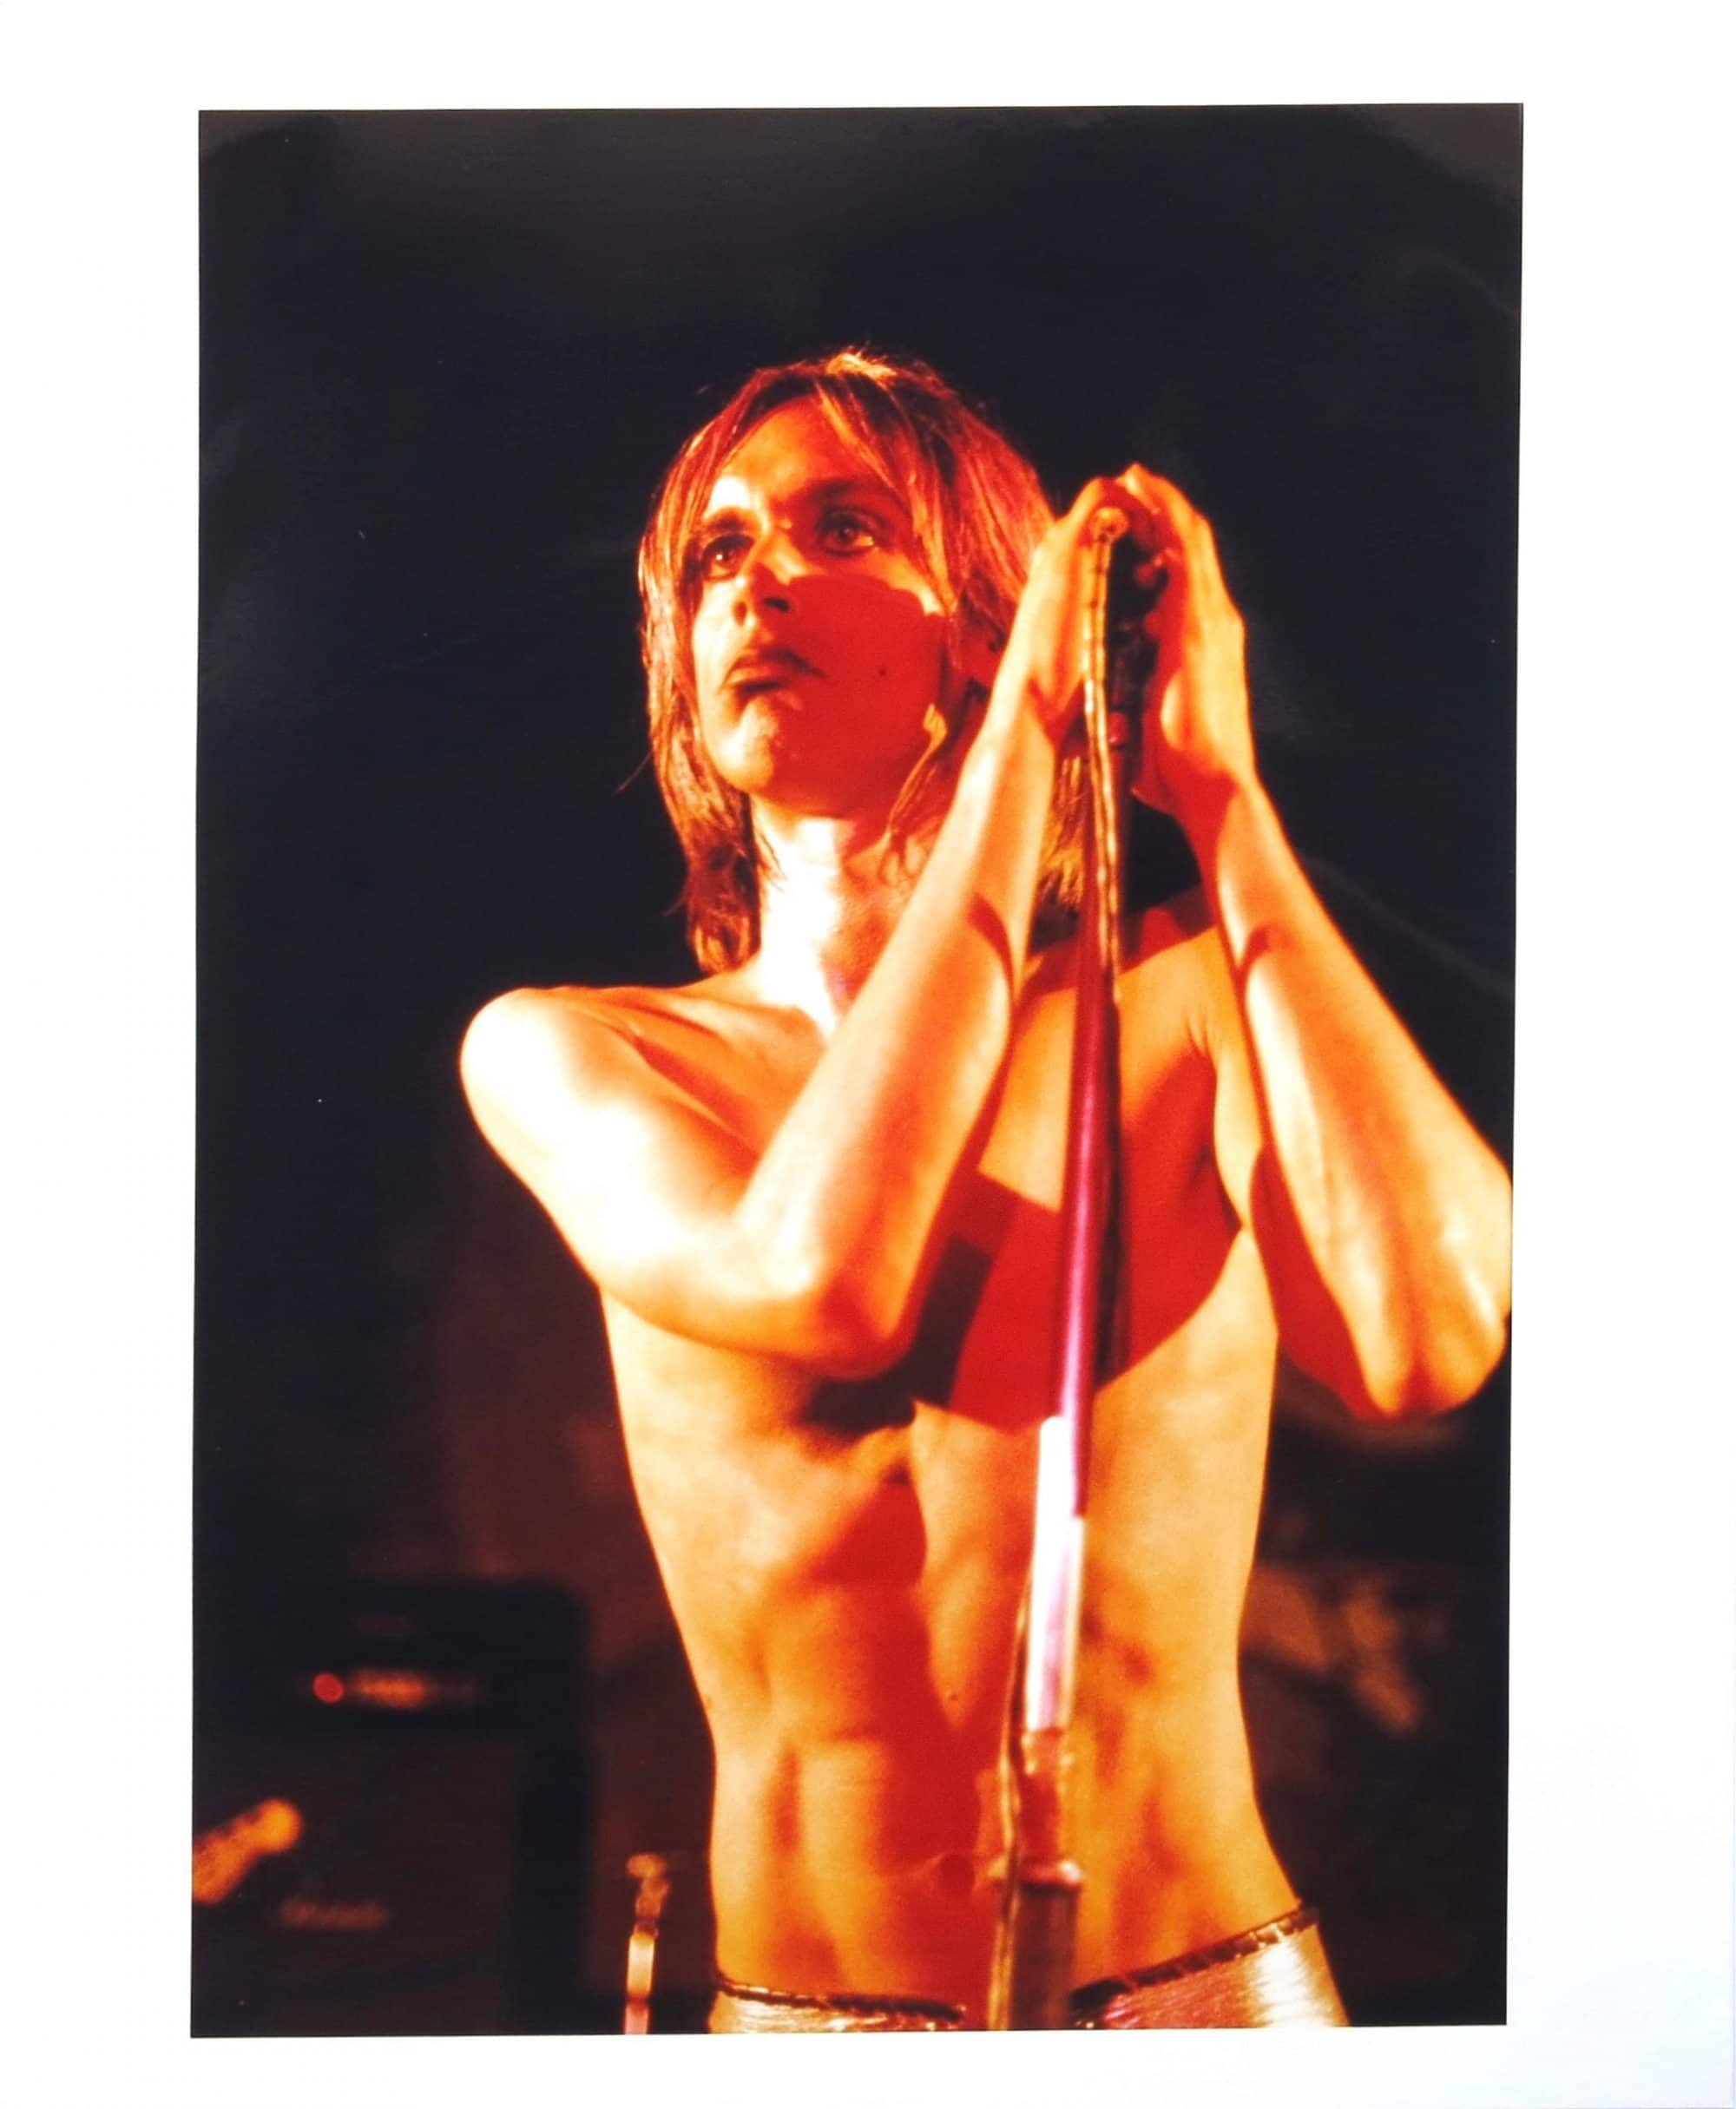 Iggy Pop Album Covers Minimalist iggy pop – mick rock original photograph from stooges 'raw power